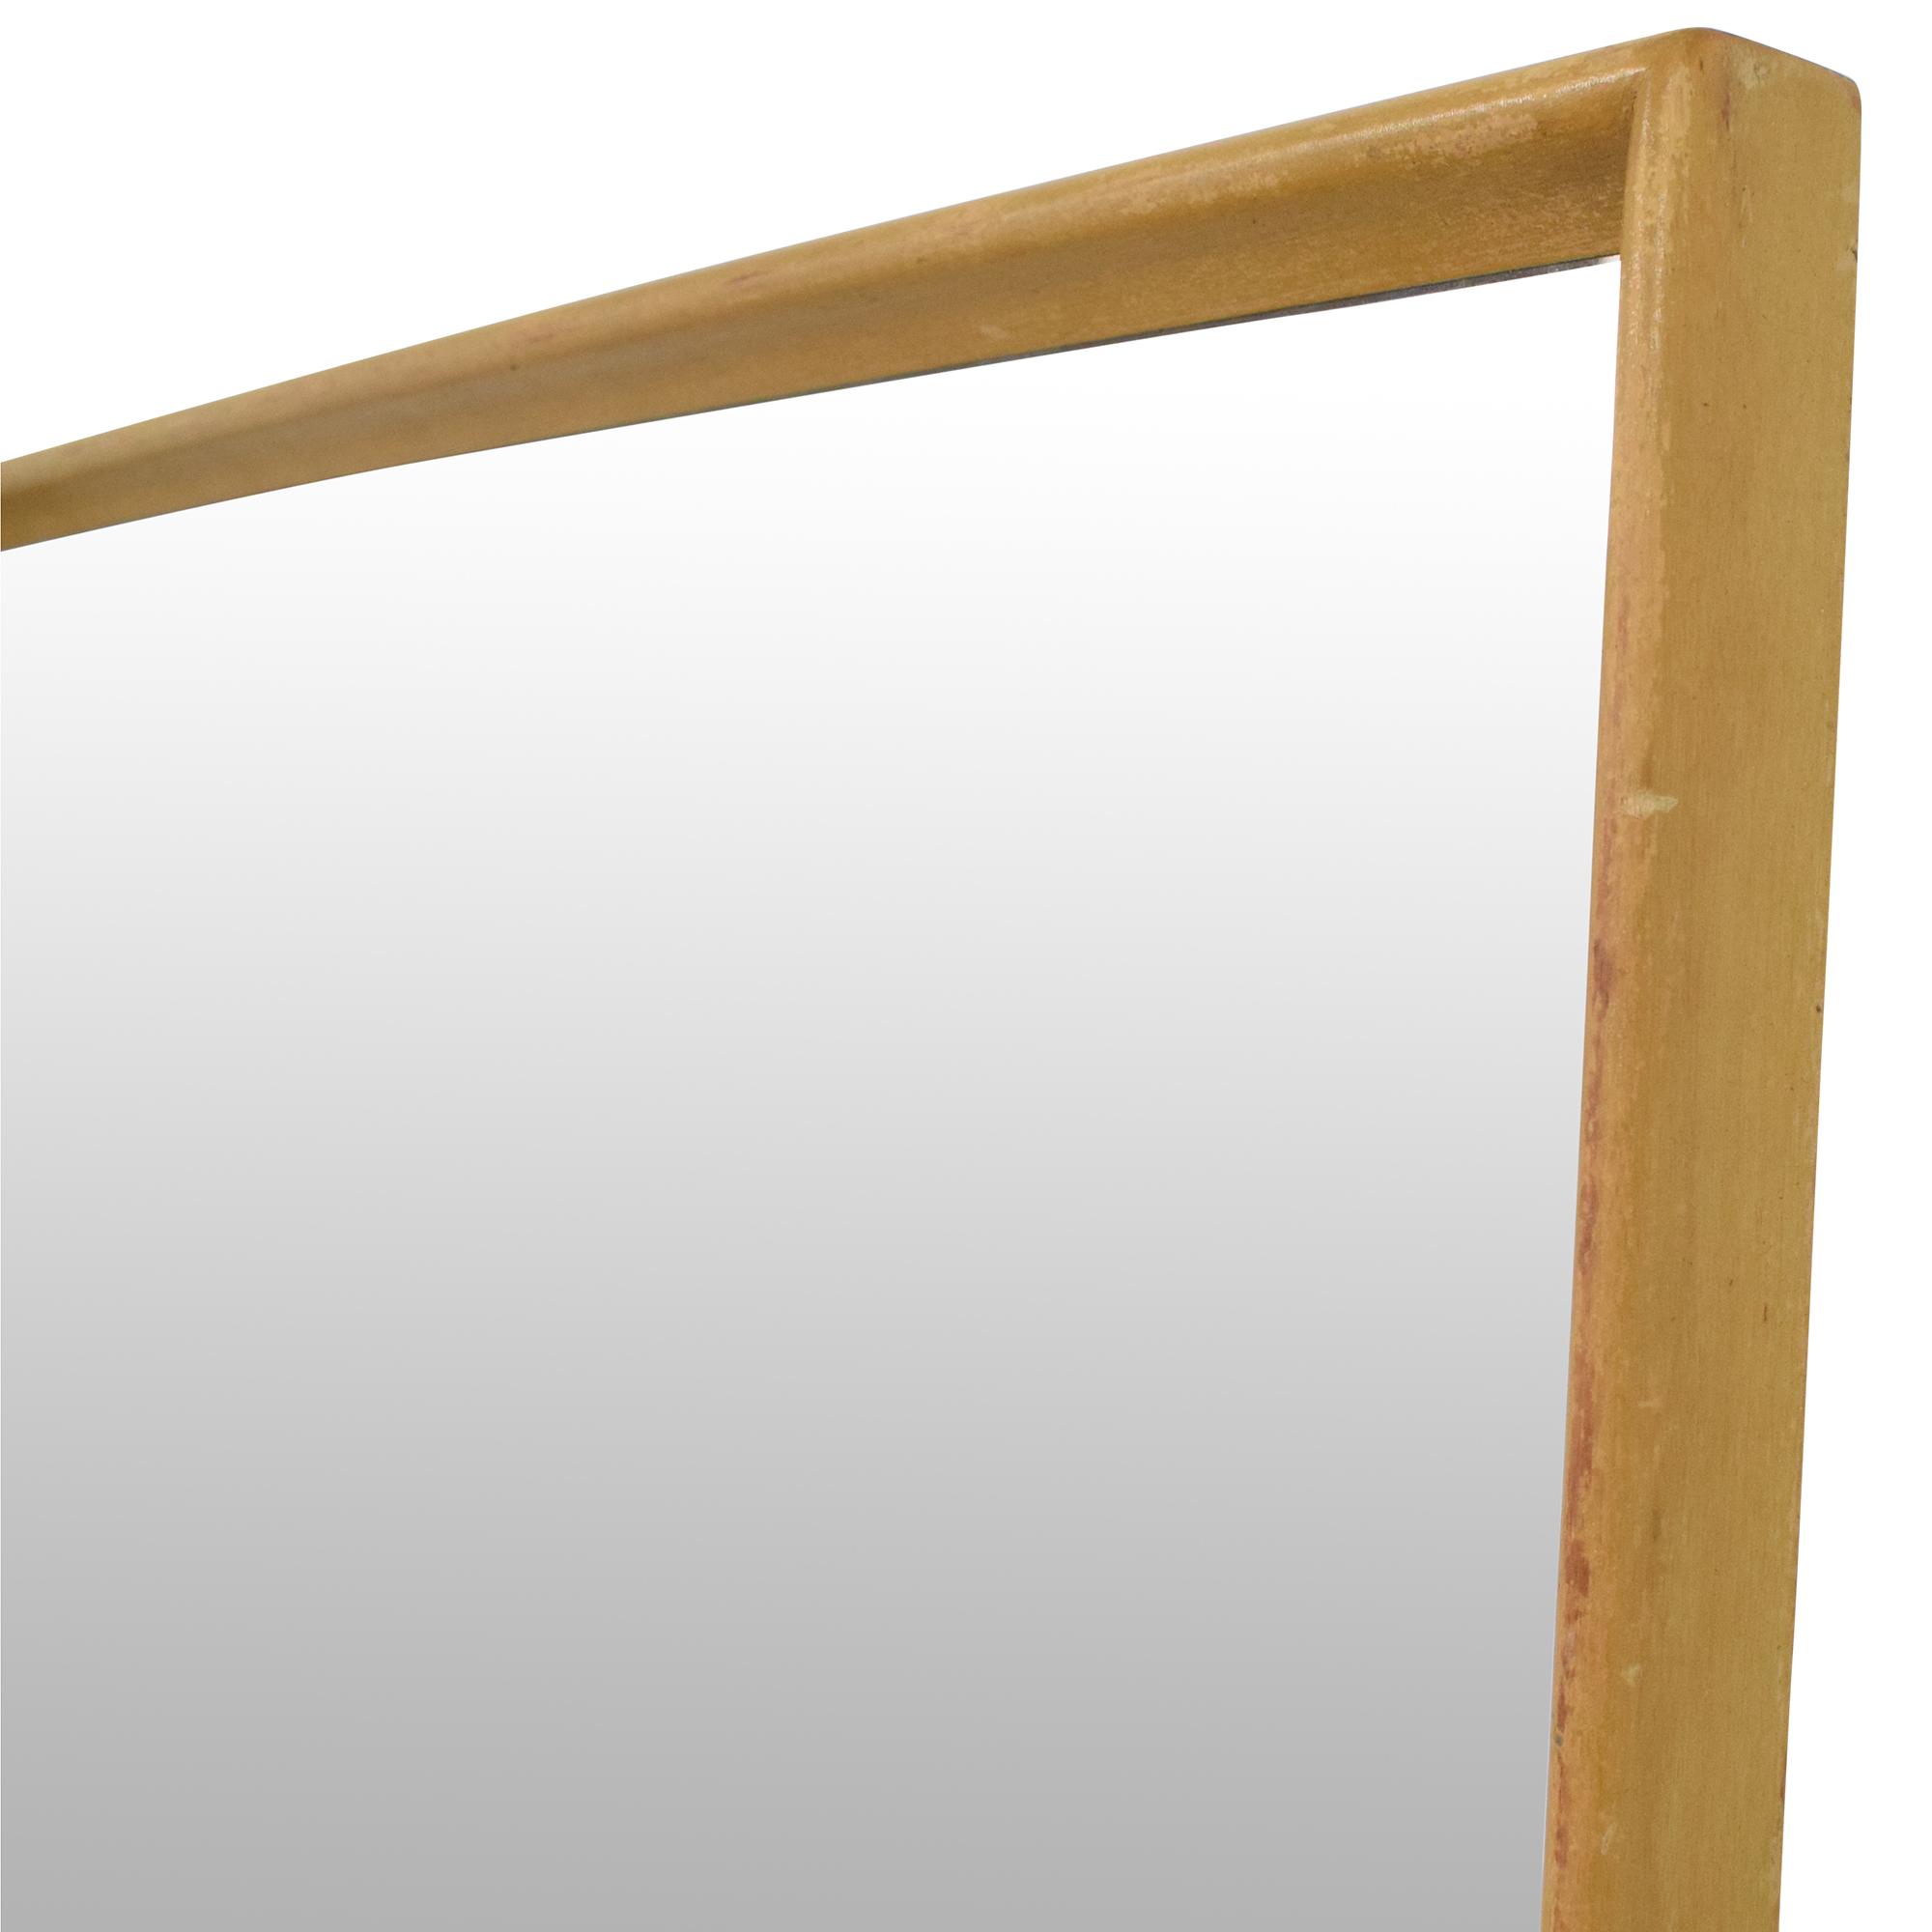 Heywood-Wakefield Heywood-Wakefield Encore Eight Drawer Dresser with Mirror Storage